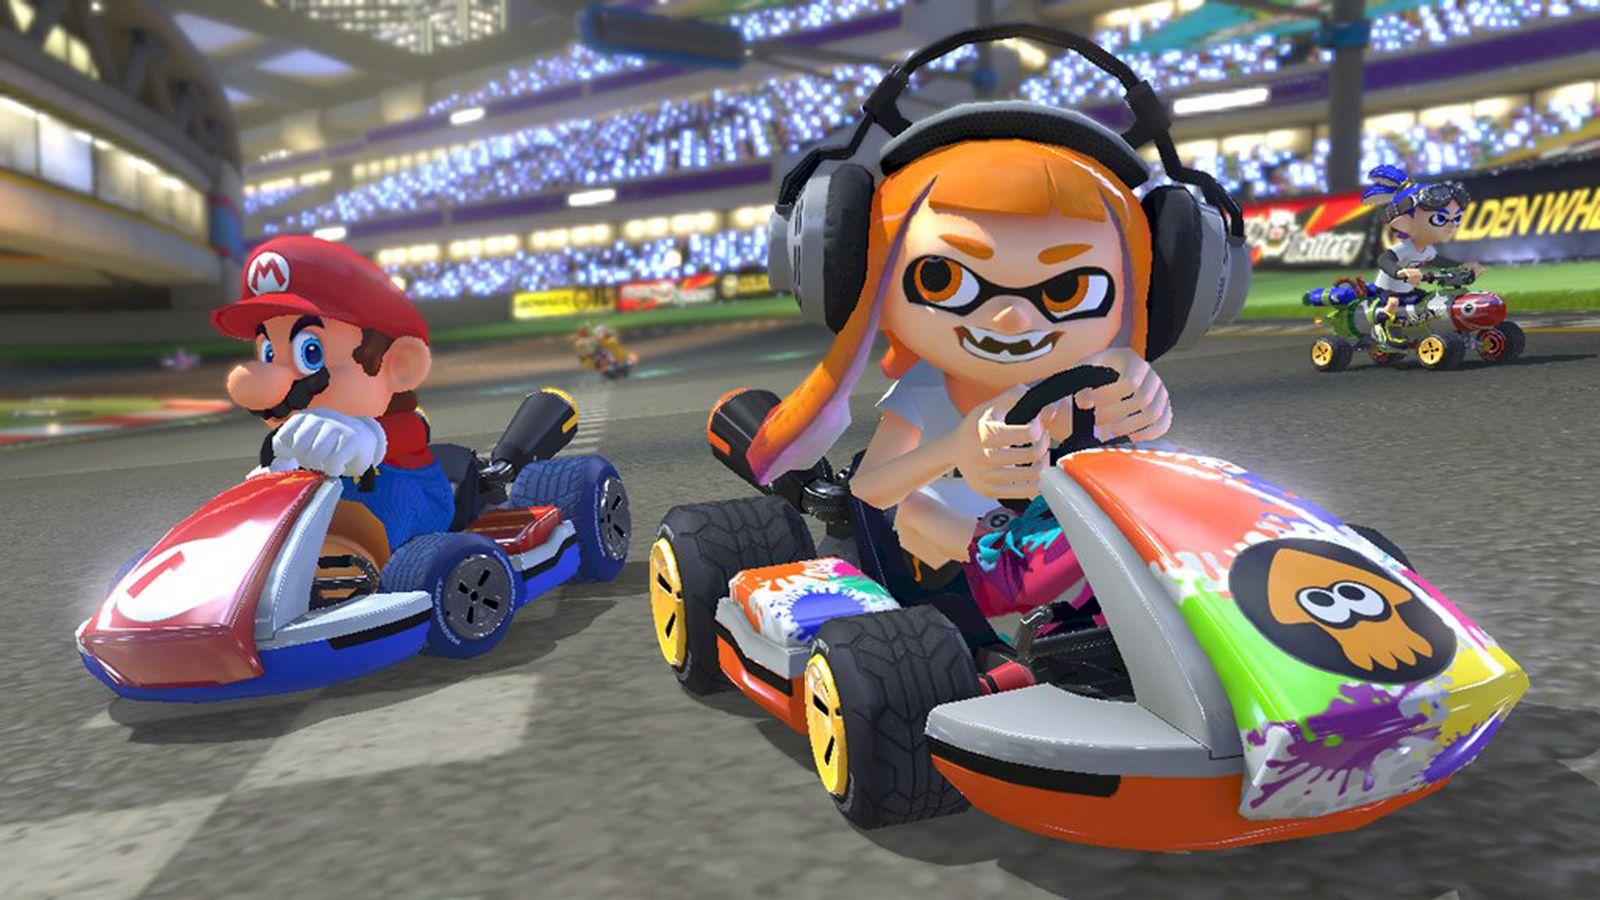 Mario Kart 8 Deluxe Mario and Inkling Girl racing